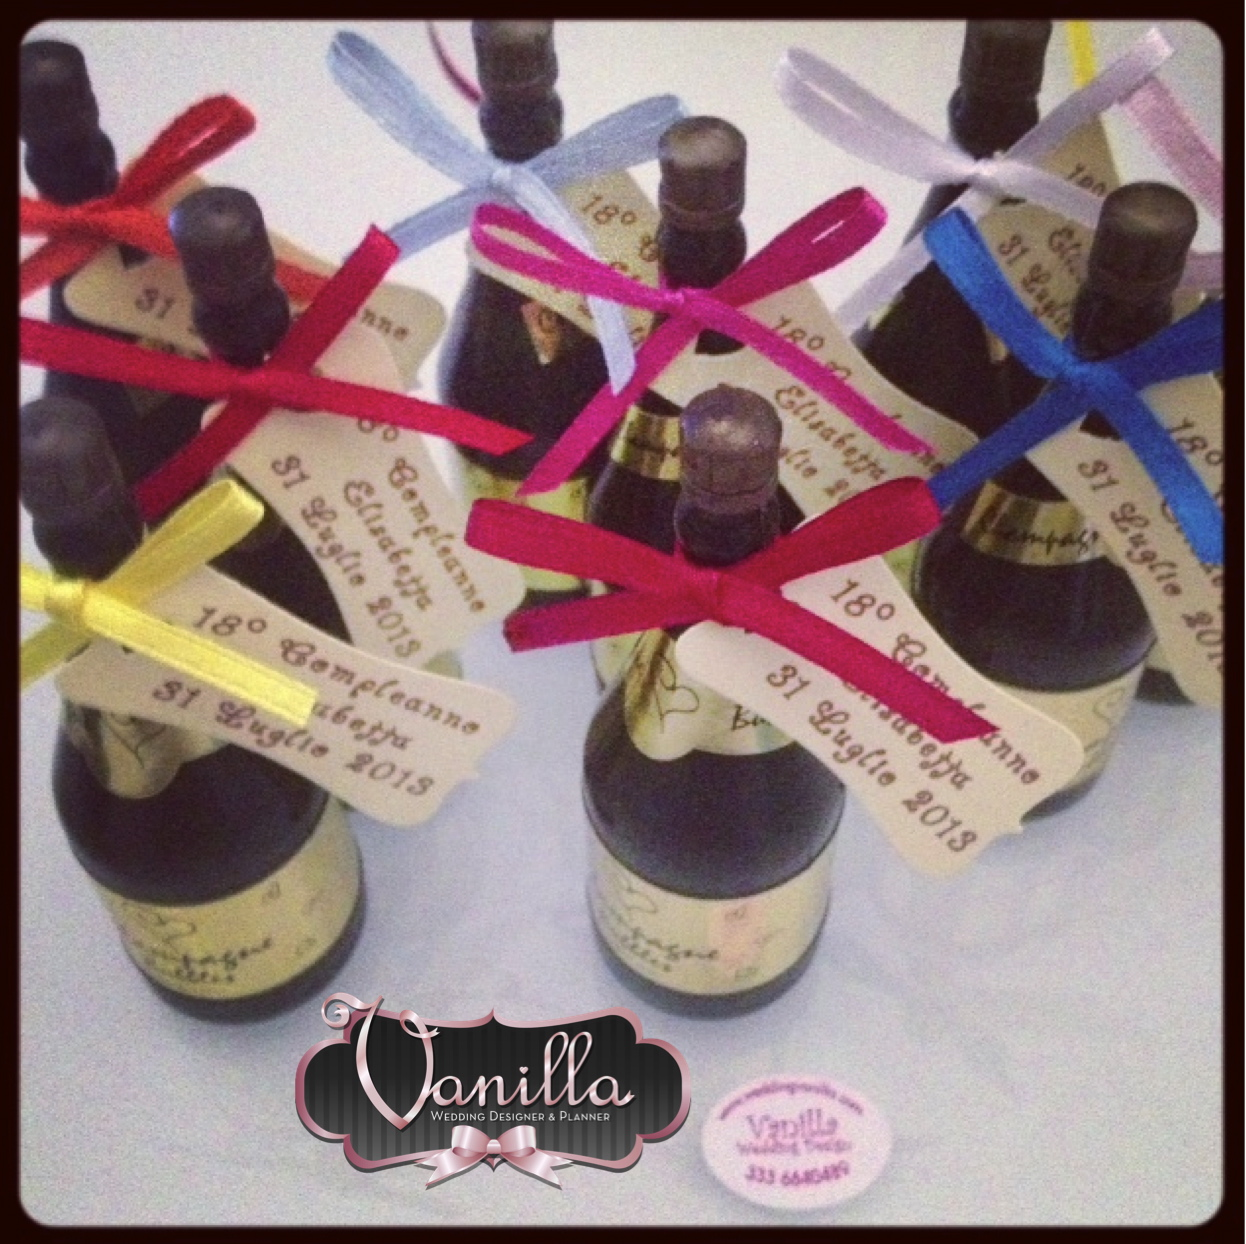 Extrêmement Vanilla Wedding Design: FESTA spumeggiante di 18 ANNI. auguri  JP62